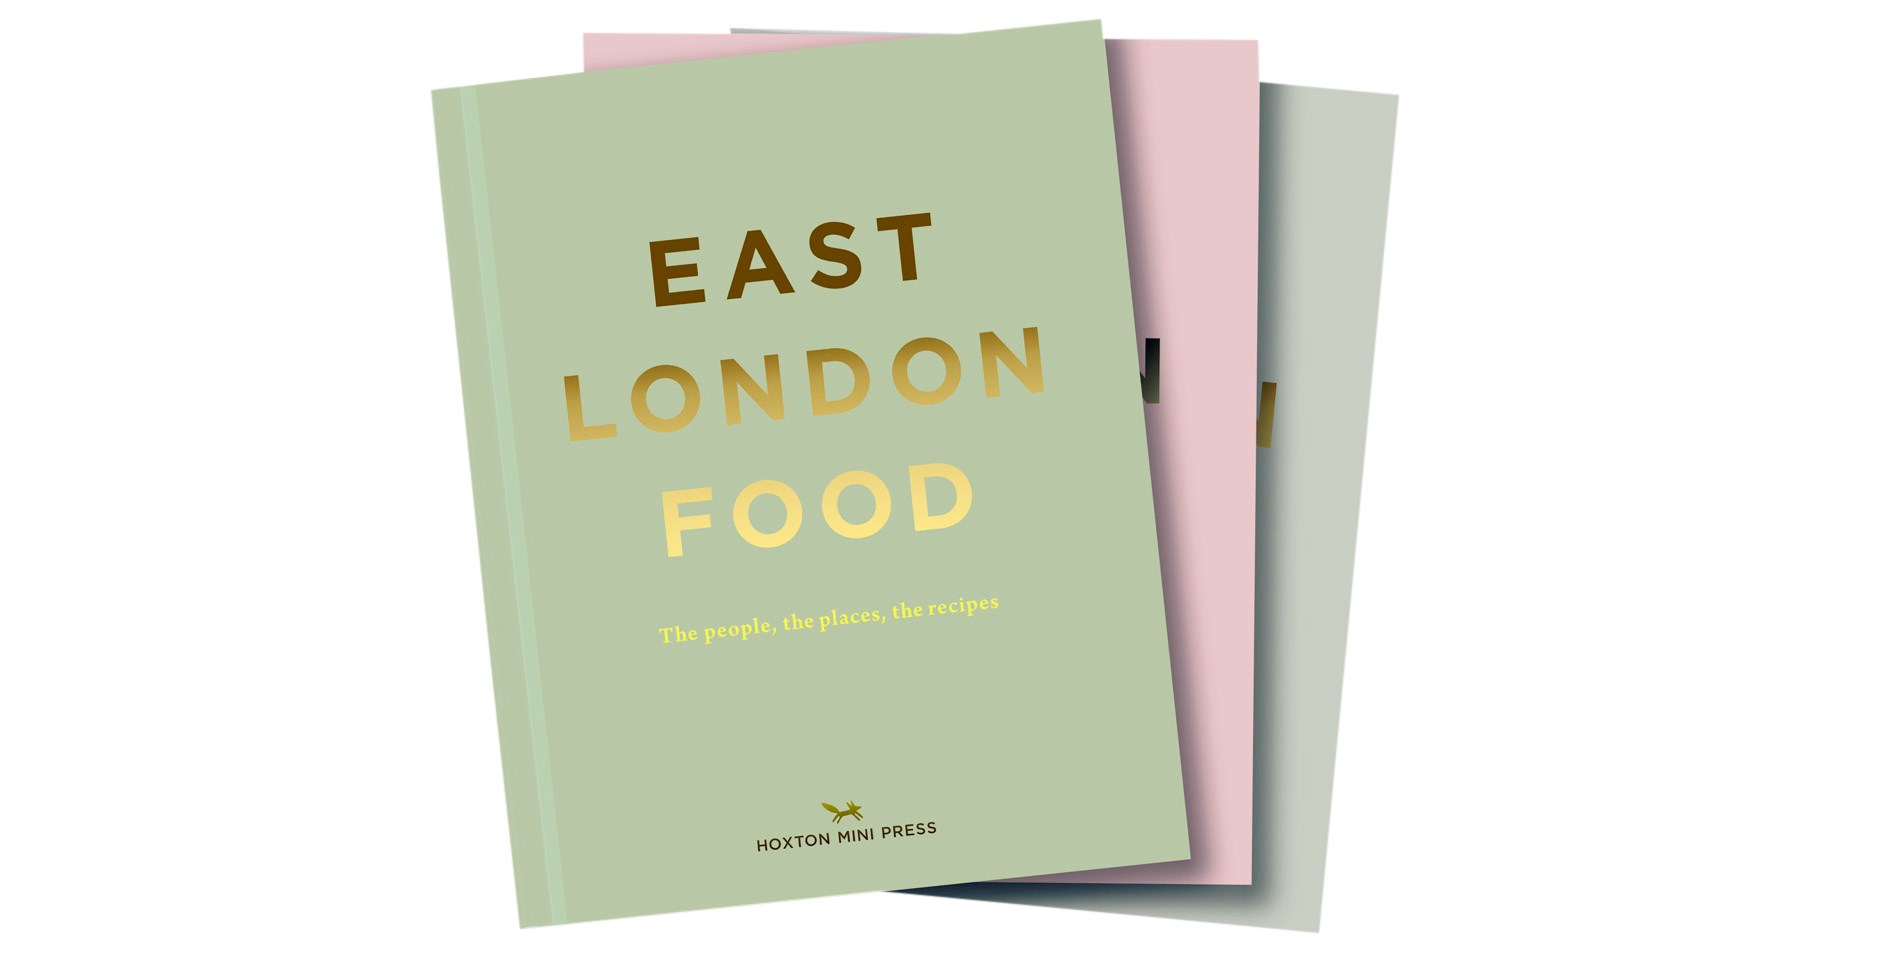 east london food book